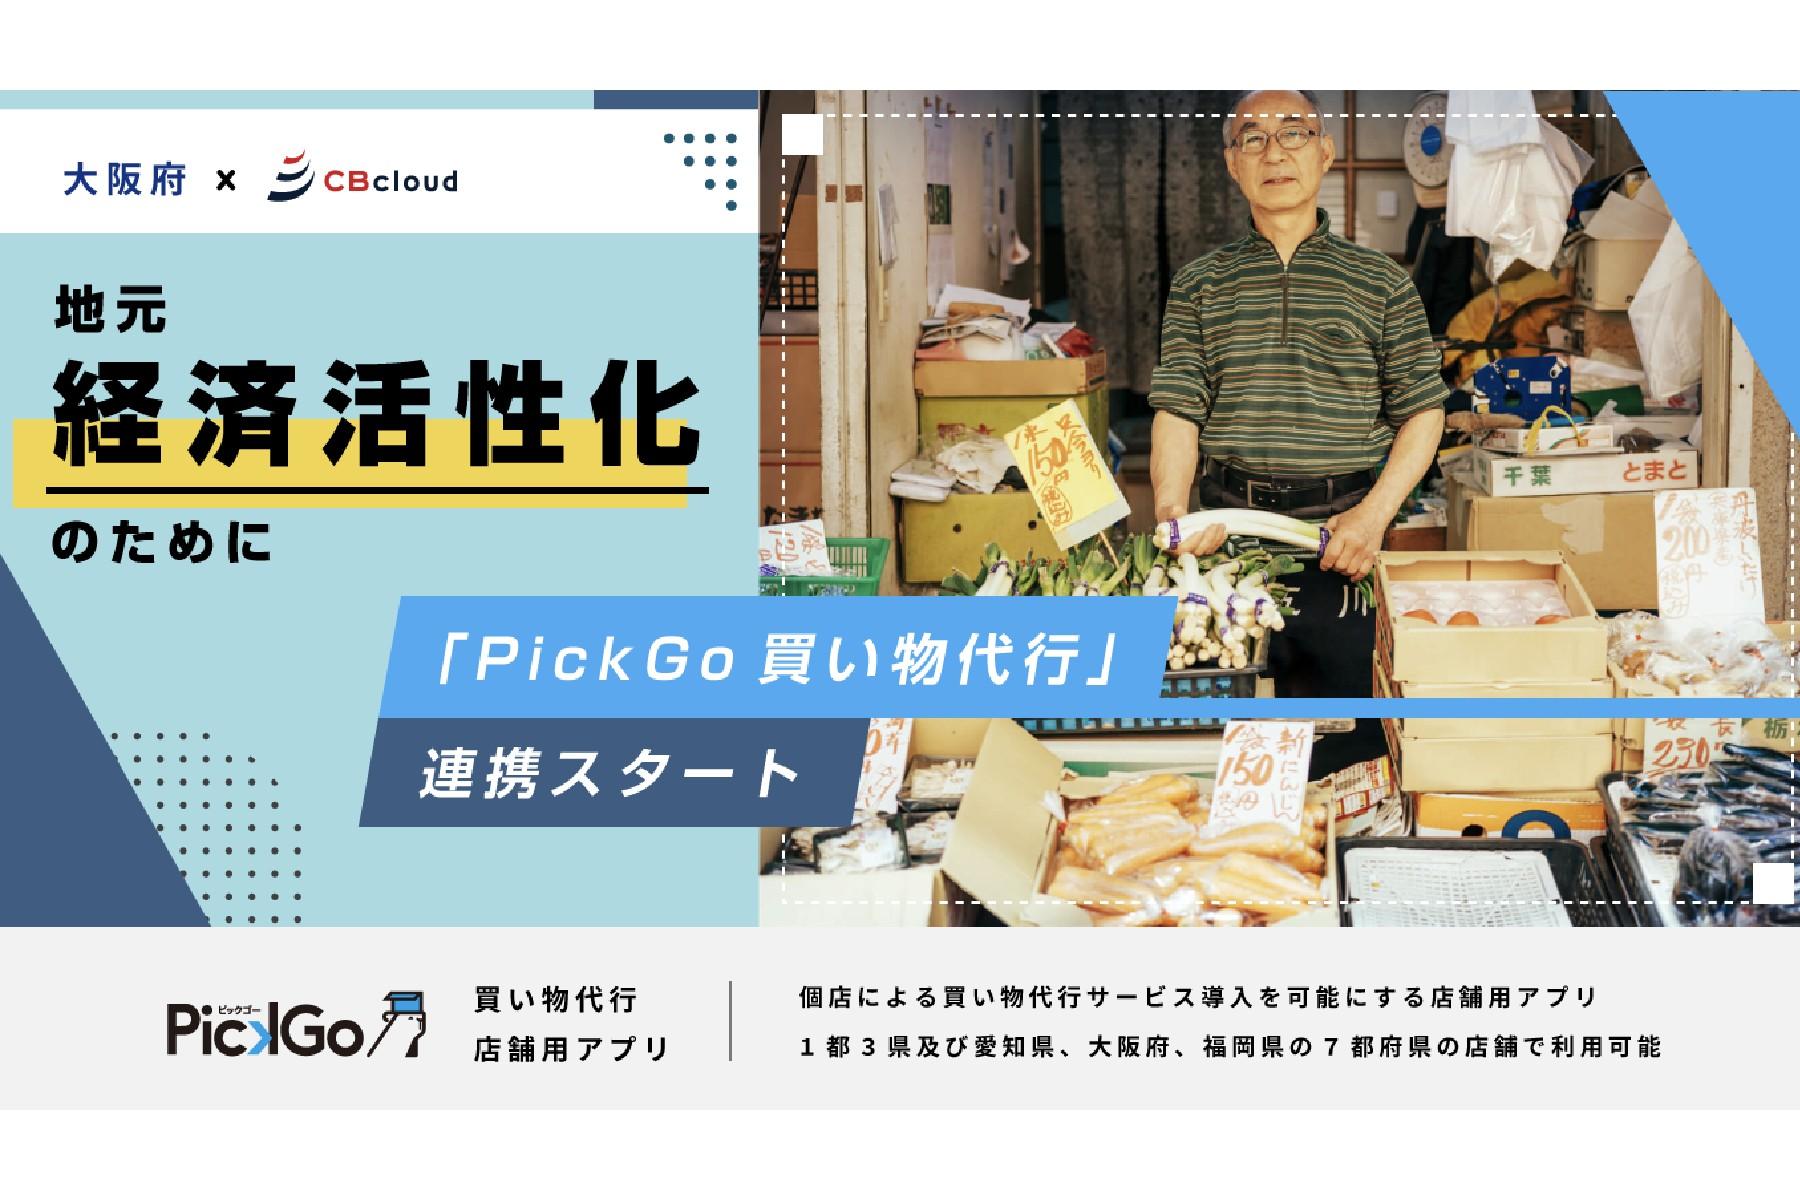 CBcloud×大阪府 | 地元経済活性化のために「PickGo 買い物代行」で連携開始